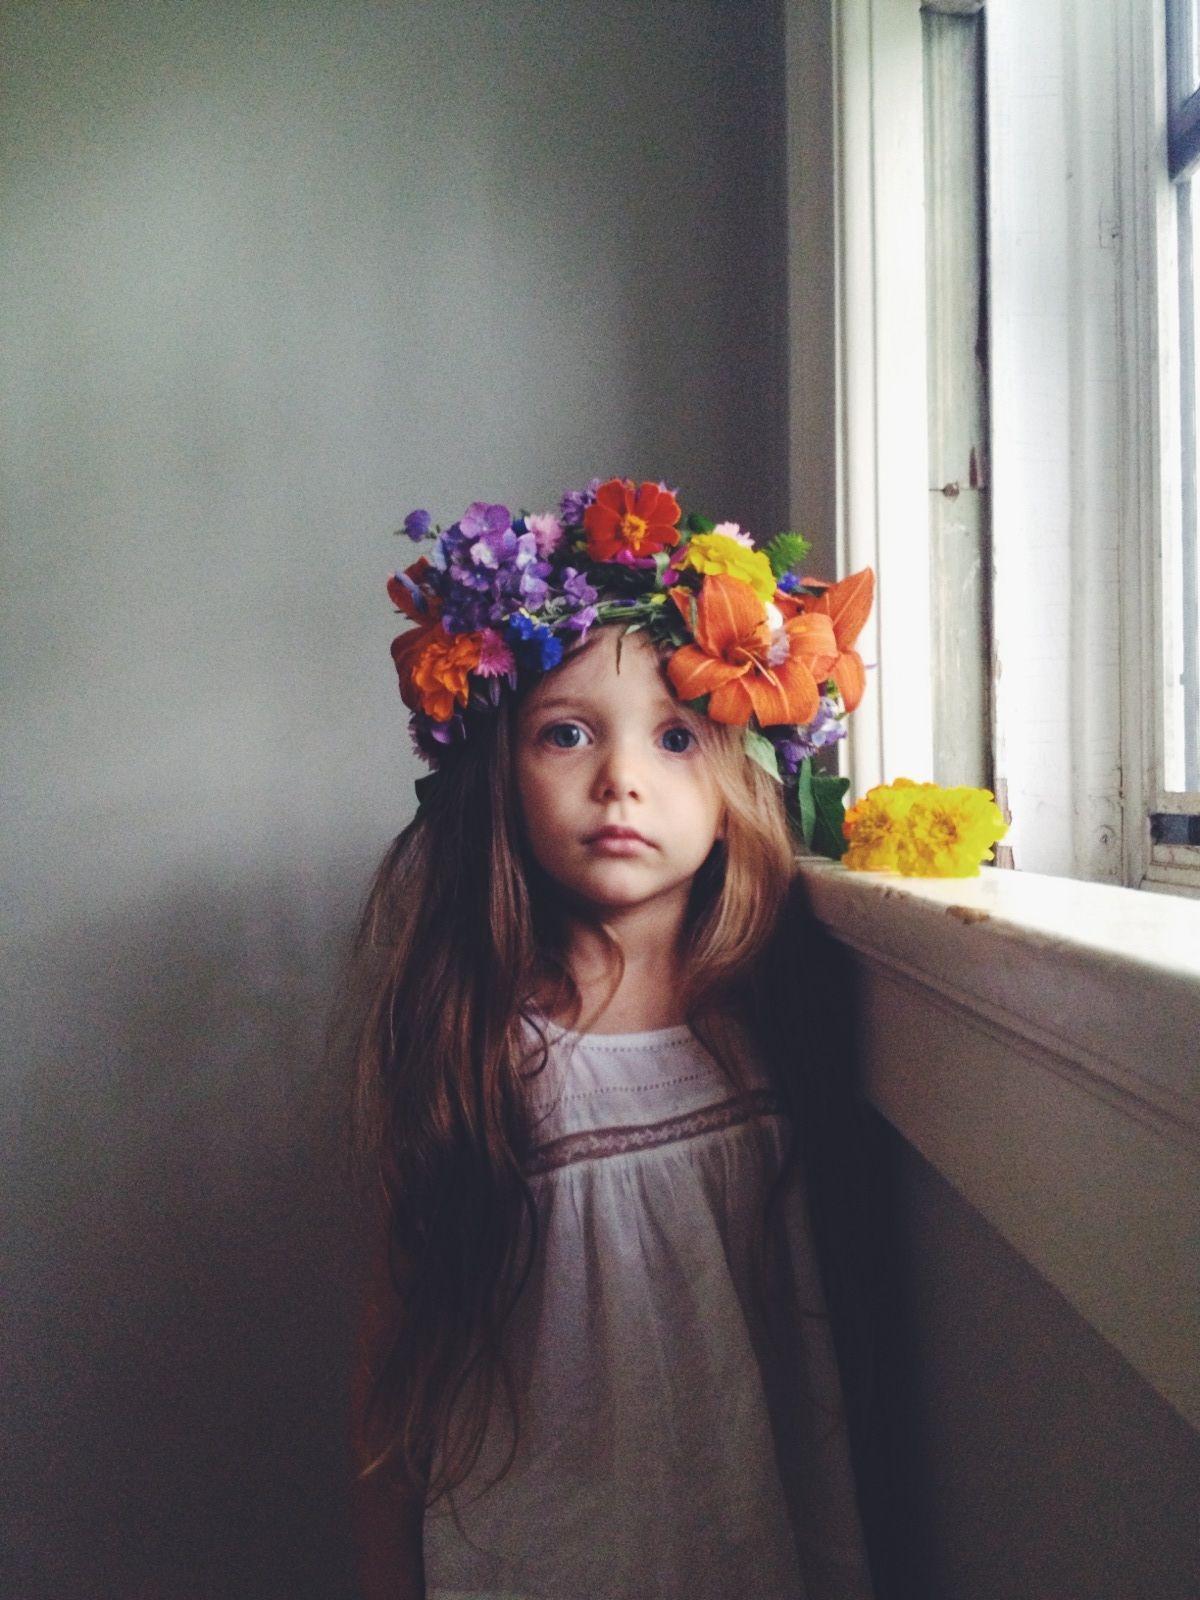 Stefania Malikova dreams of changing her name 05.02.2017 21